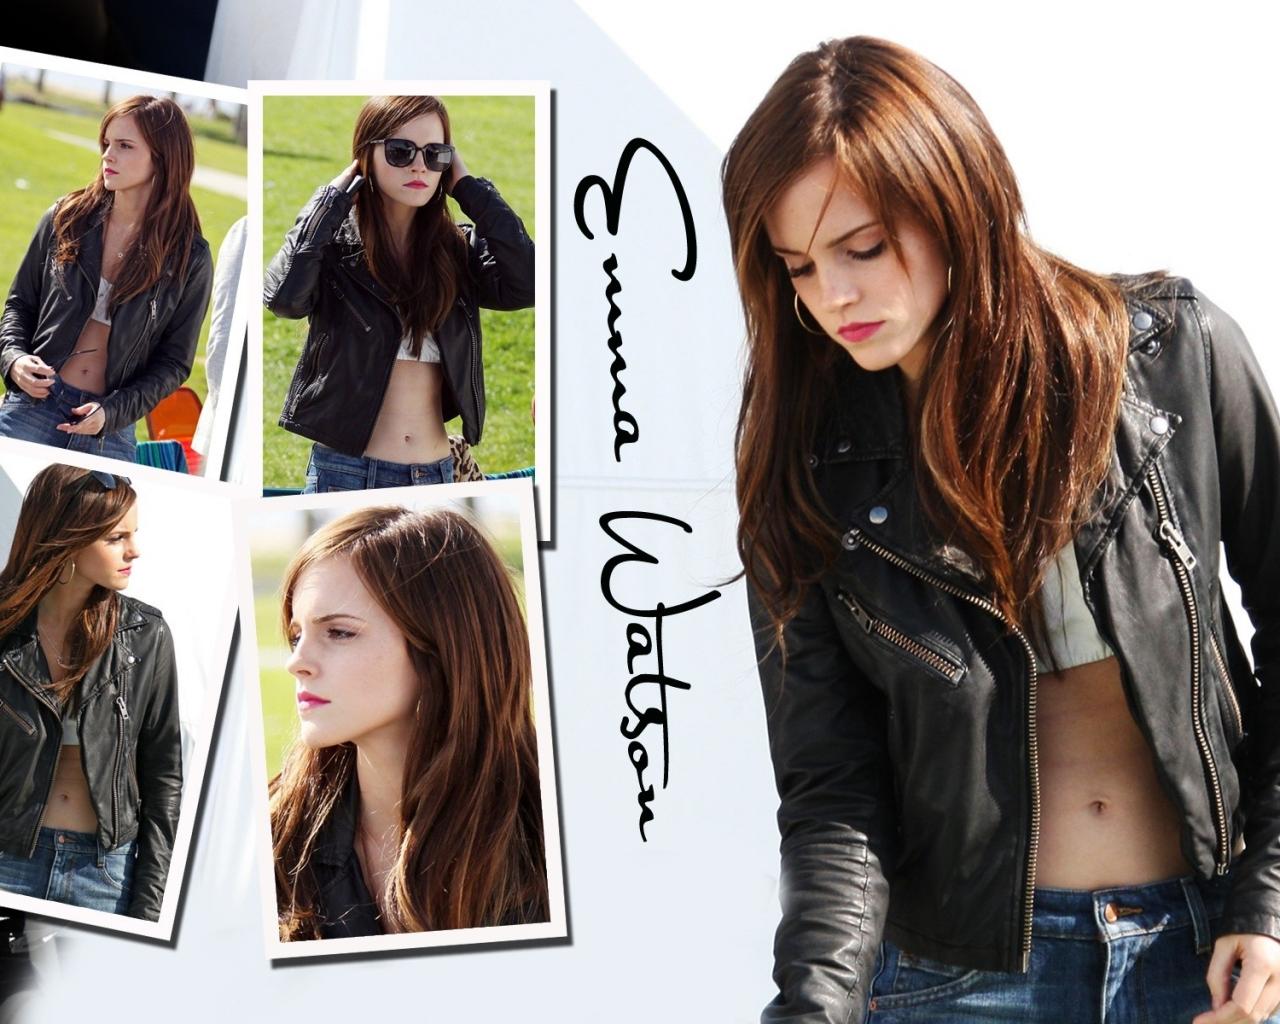 Emma Watson collage - 1280x1024